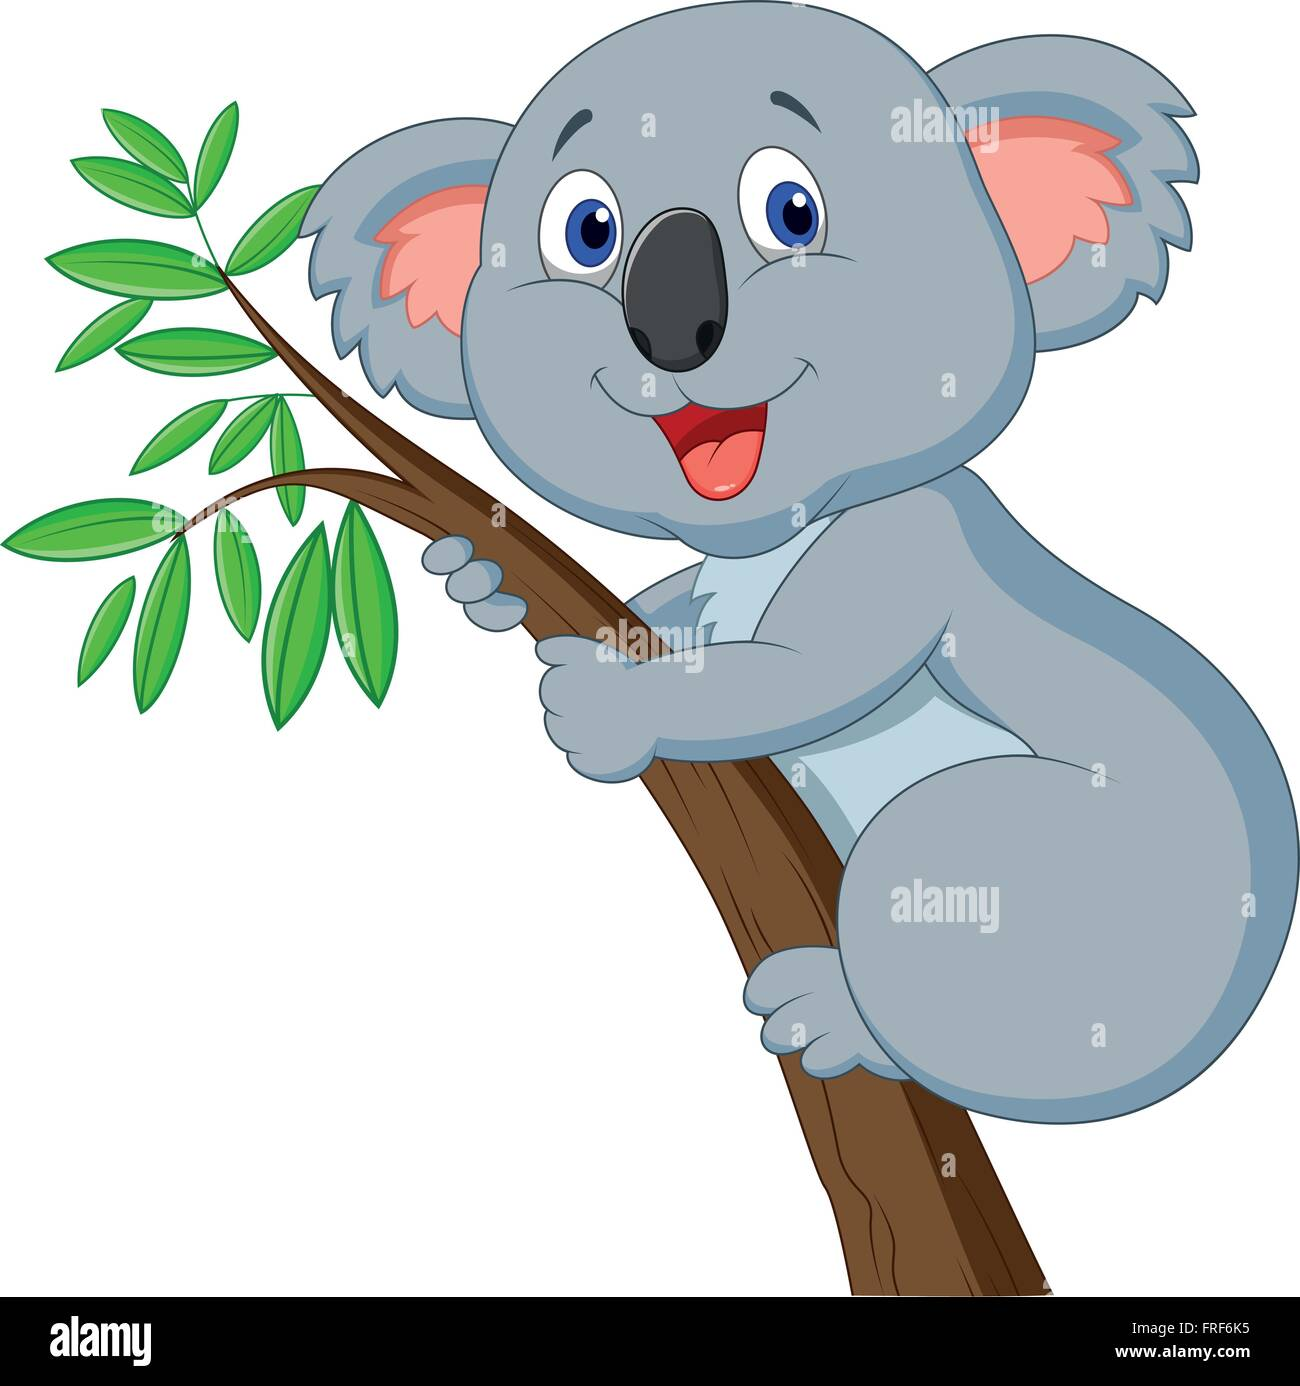 Cute Koala Cartoon On A Tree Stock Vector Image Art Alamy First attempt at drawing a cartoon koala bear. https www alamy com stock photo cute koala cartoon on a tree 100523449 html